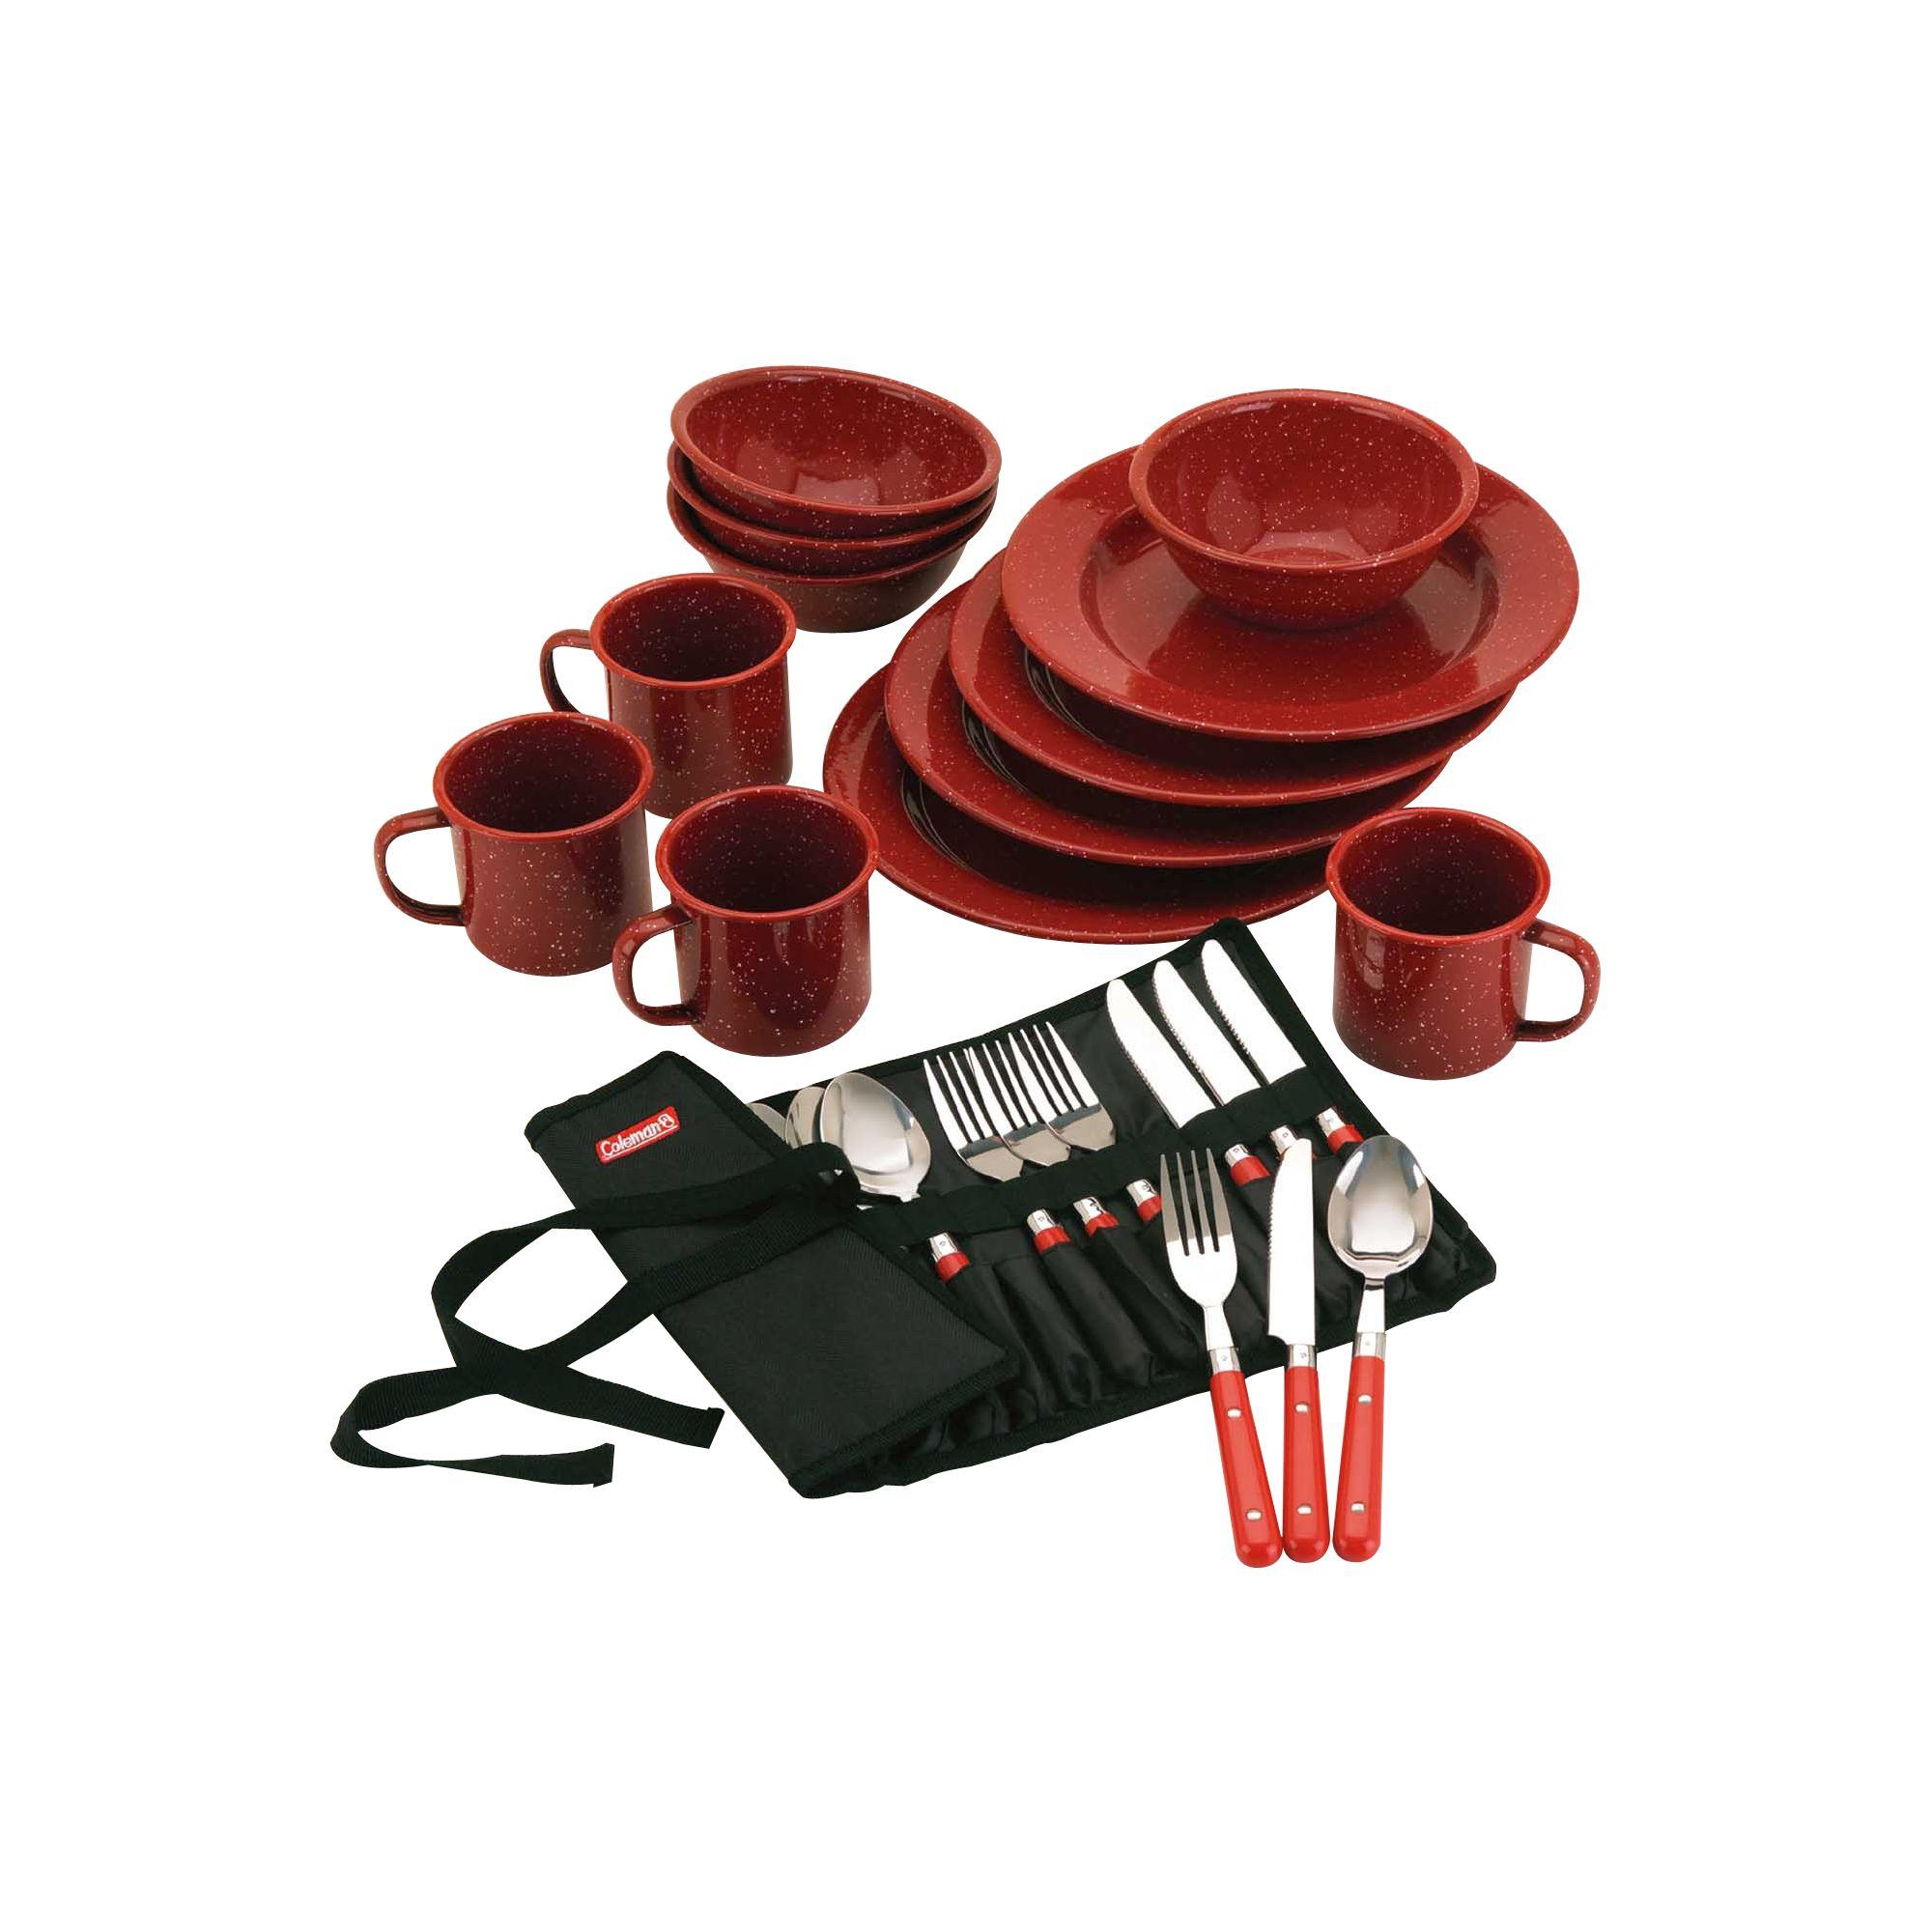 Coleman 24 Piece Enamelware Dish Set And Flatware